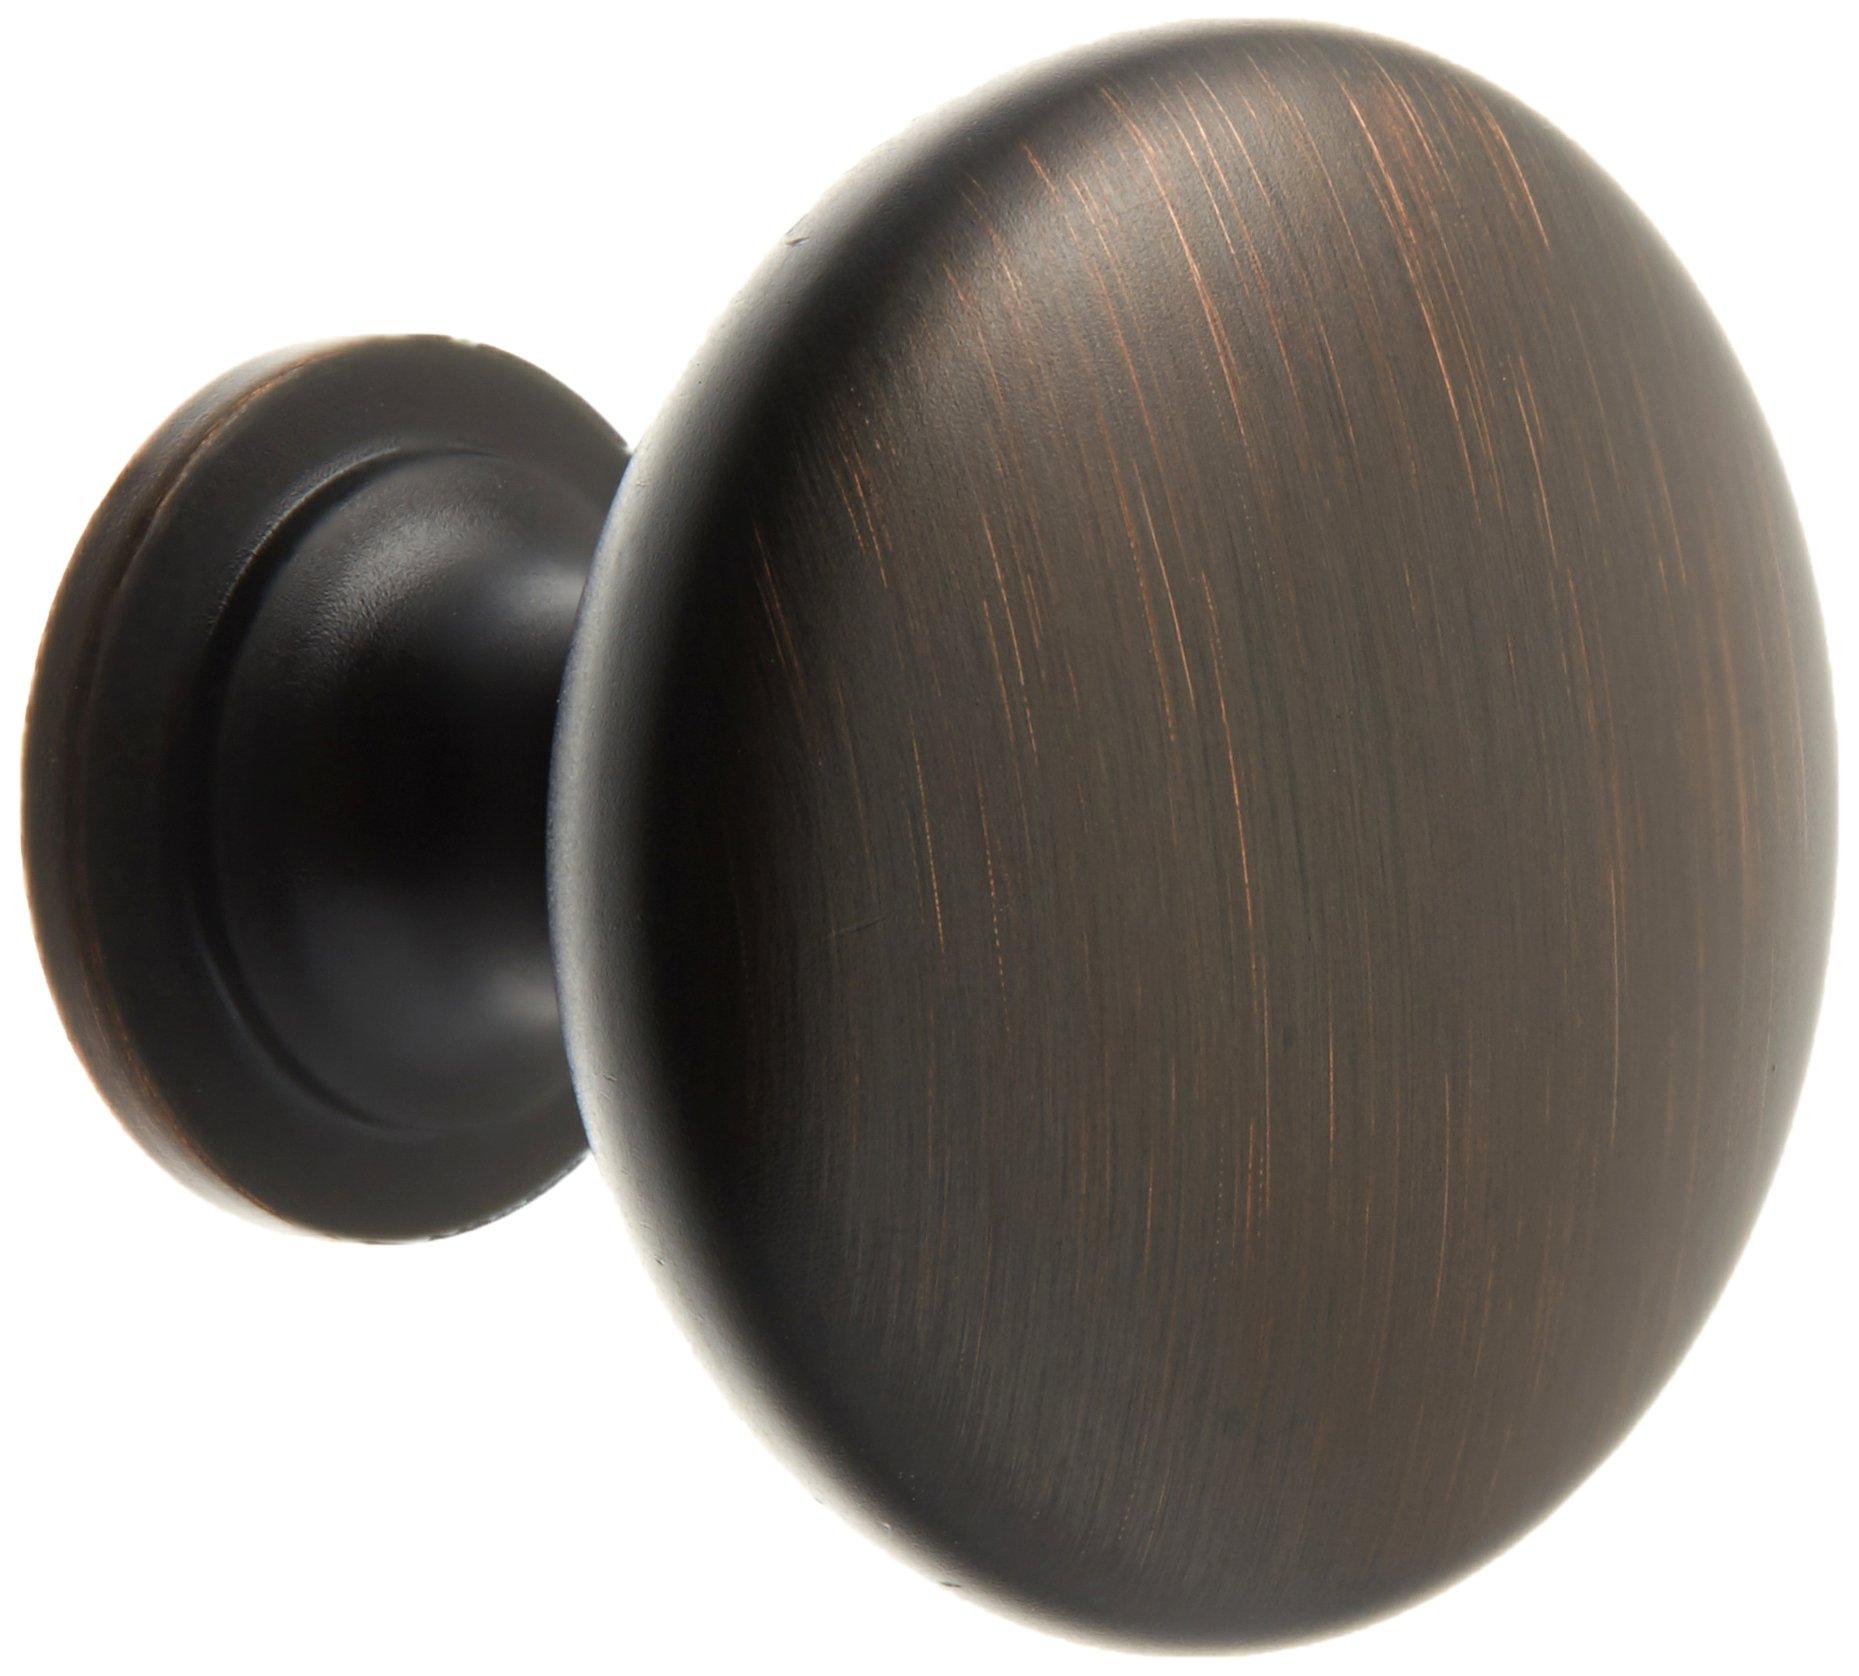 Amerock BP53005-ORB Allison Oil Rubbed Bronze Round Cabinet Knob 35 Pack